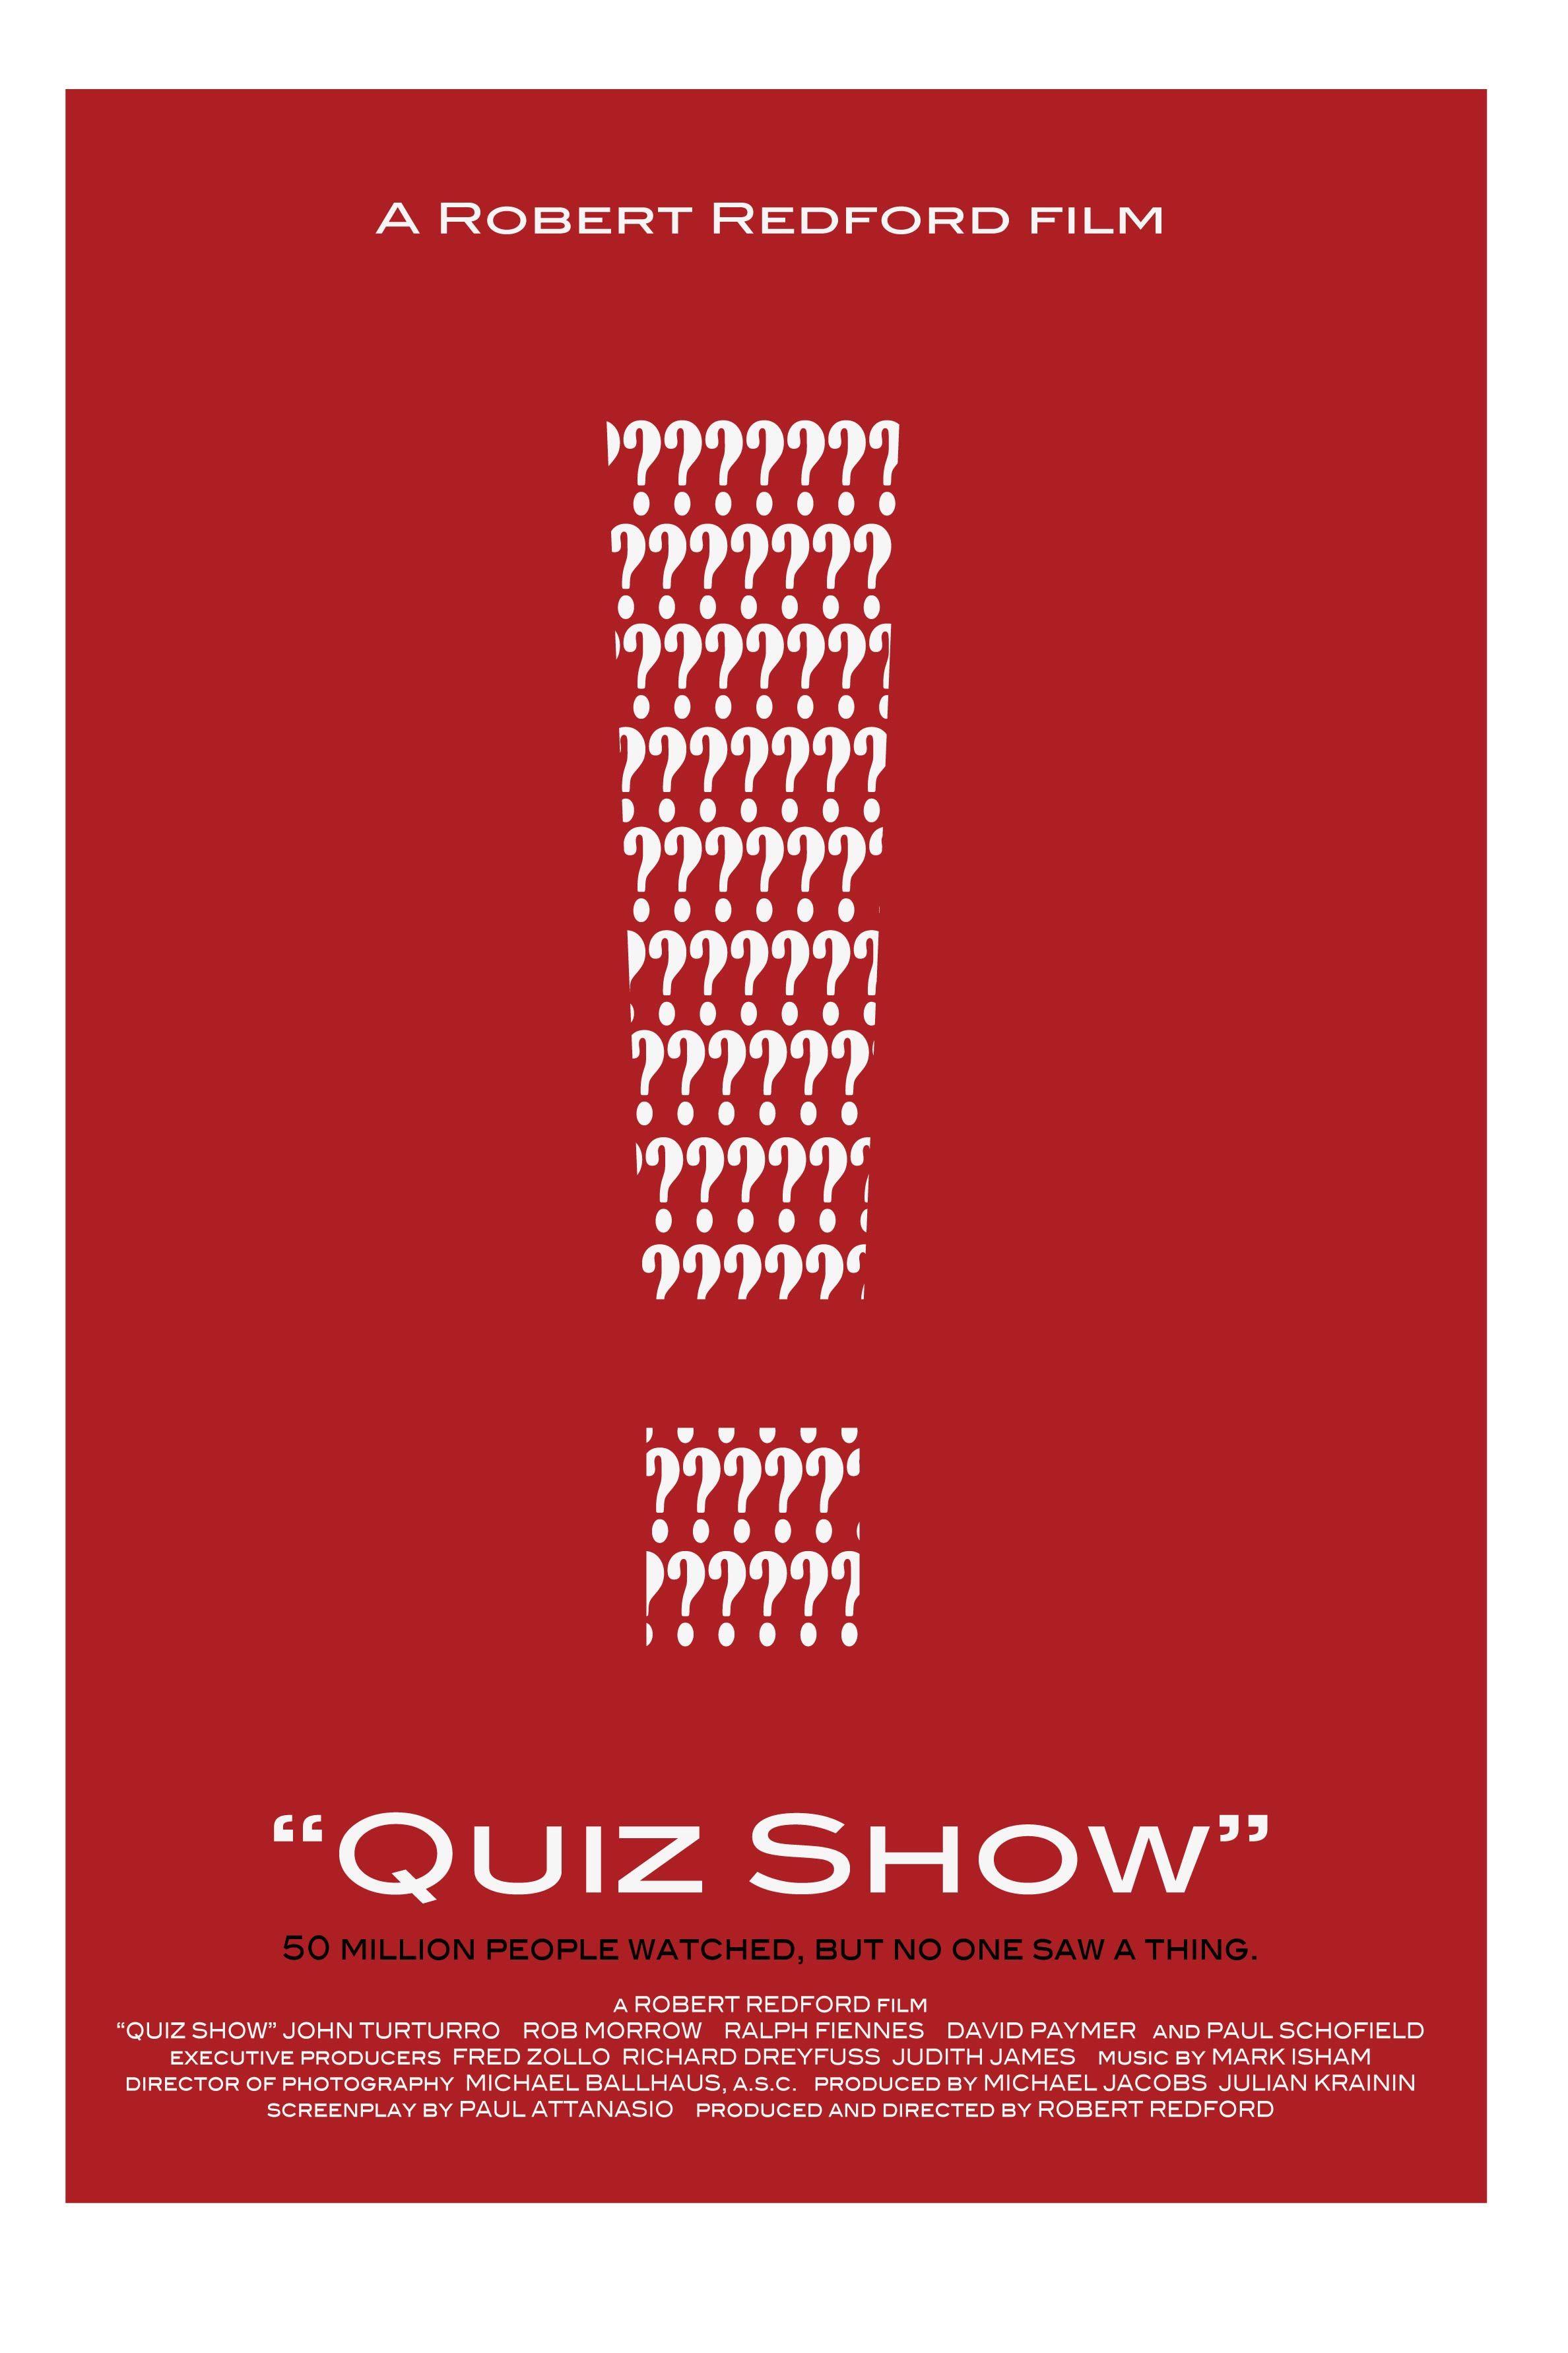 Robert Redfort Quiz Show Movie Posters Minimalist Alternative